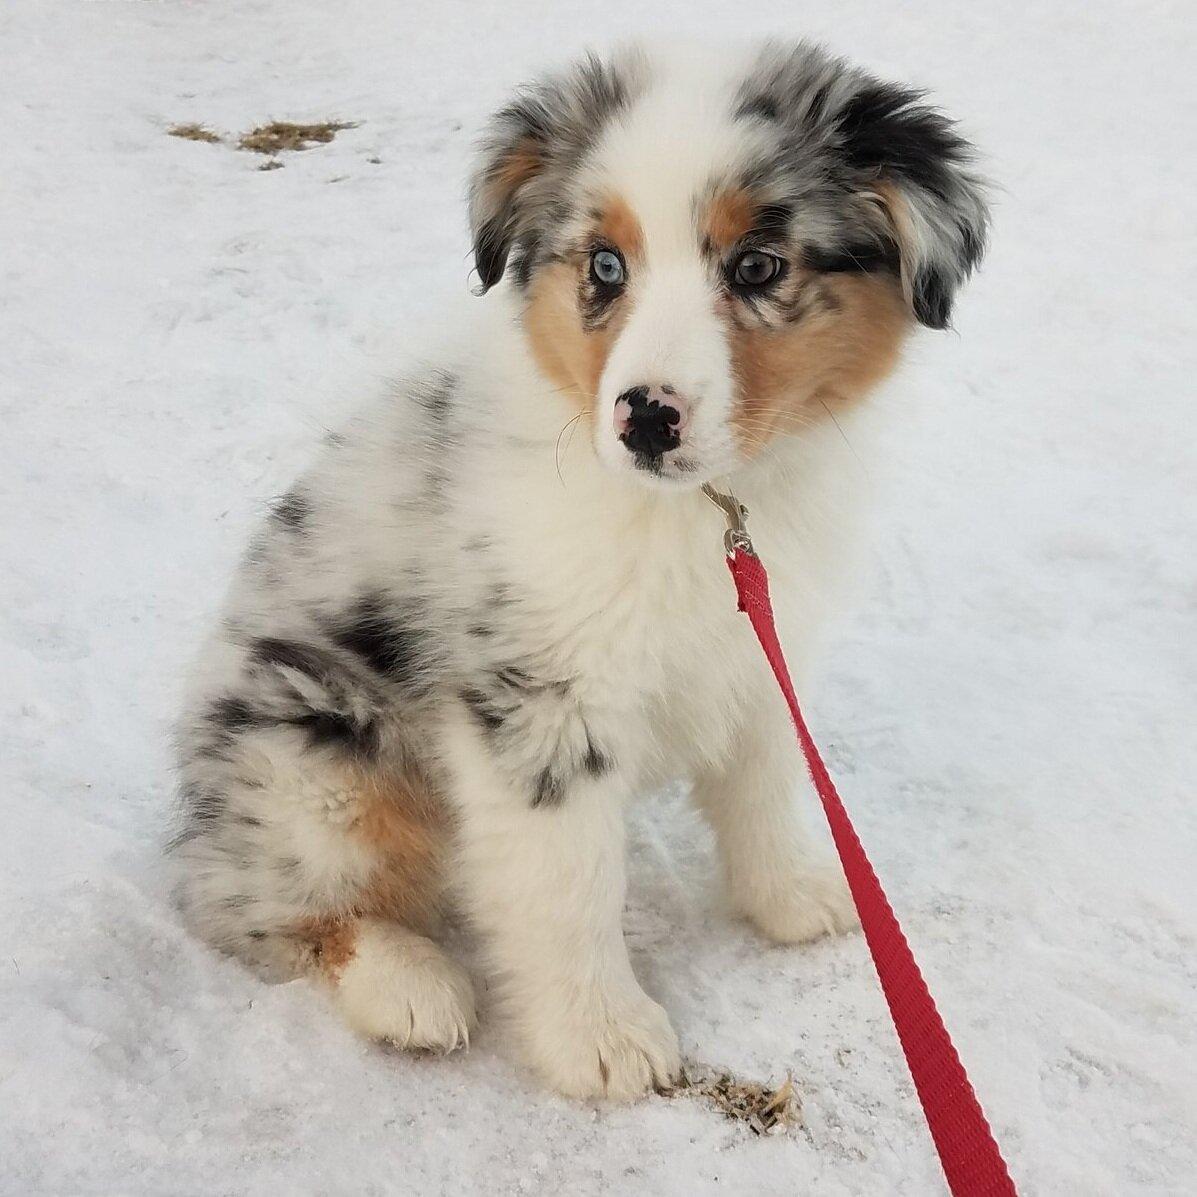 Stop puppy biting | Puppy Training Springville, UT | Bakers Acres K9 Academy